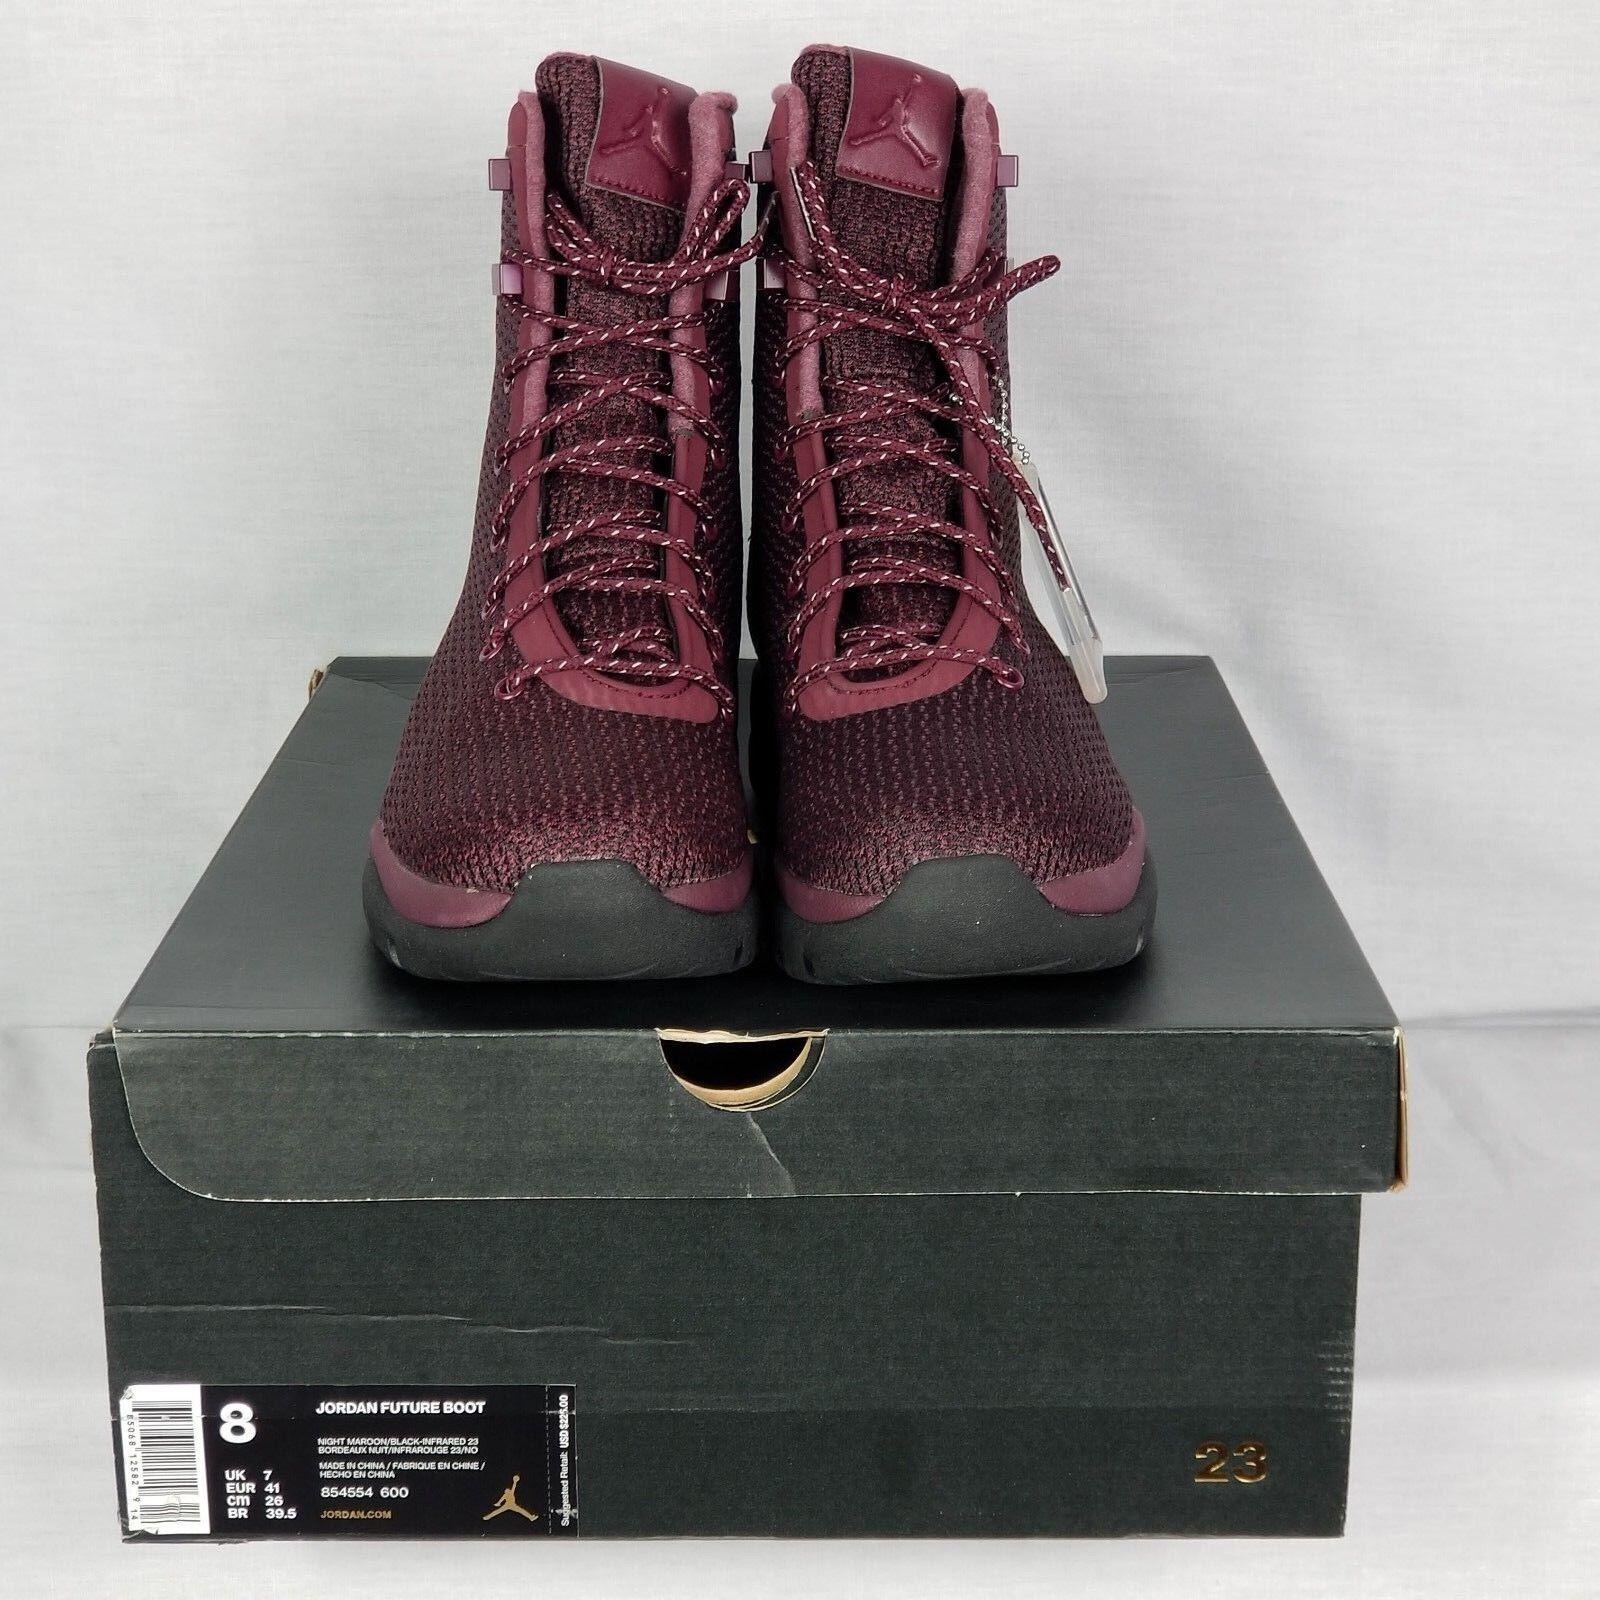 Nike Air Jordan Future Boot Size 8 Maroon Burgundy Red Black SFB 854554-600